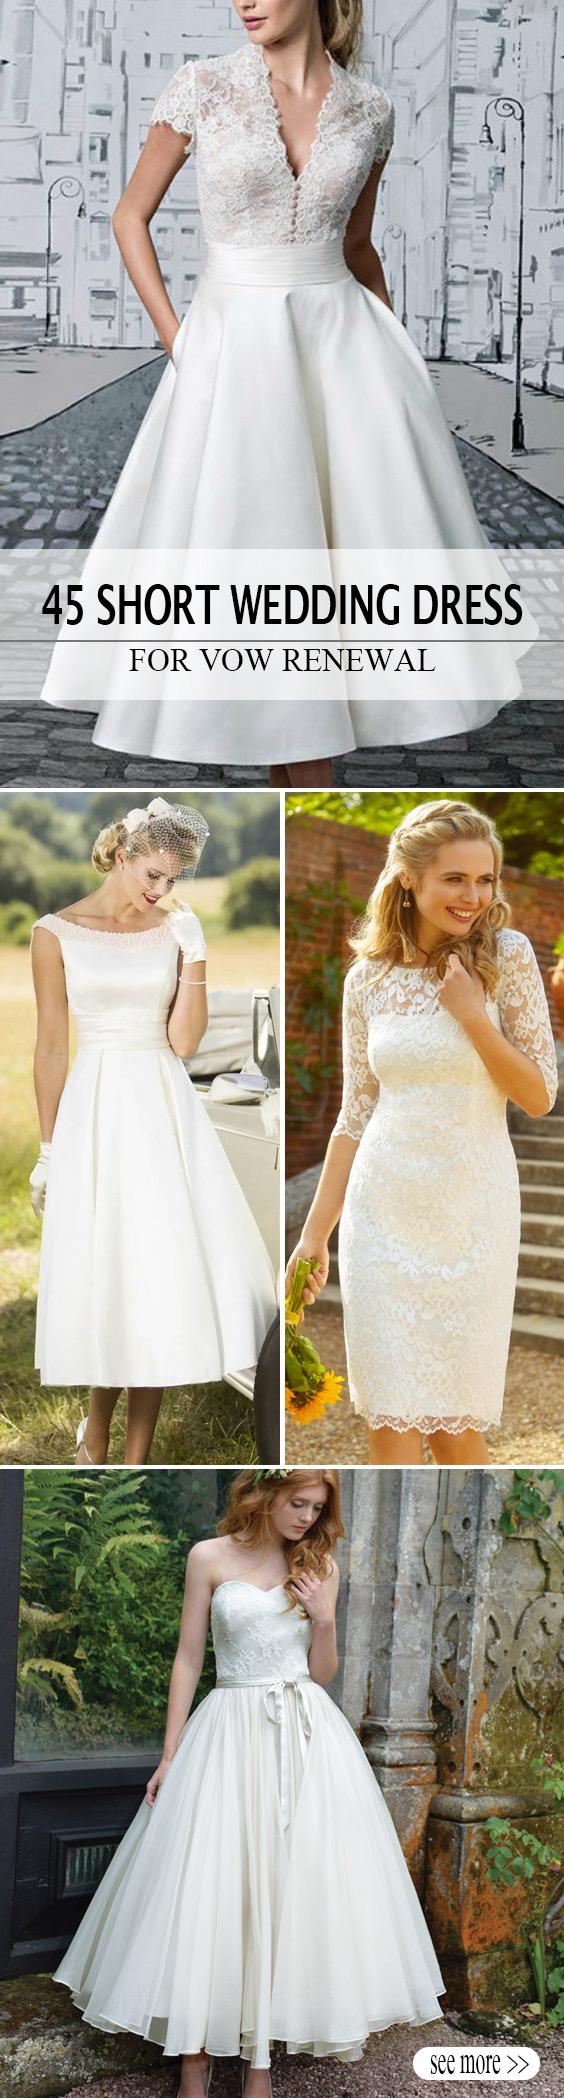 45 Amazing Short Wedding Dress For Vow Renewal